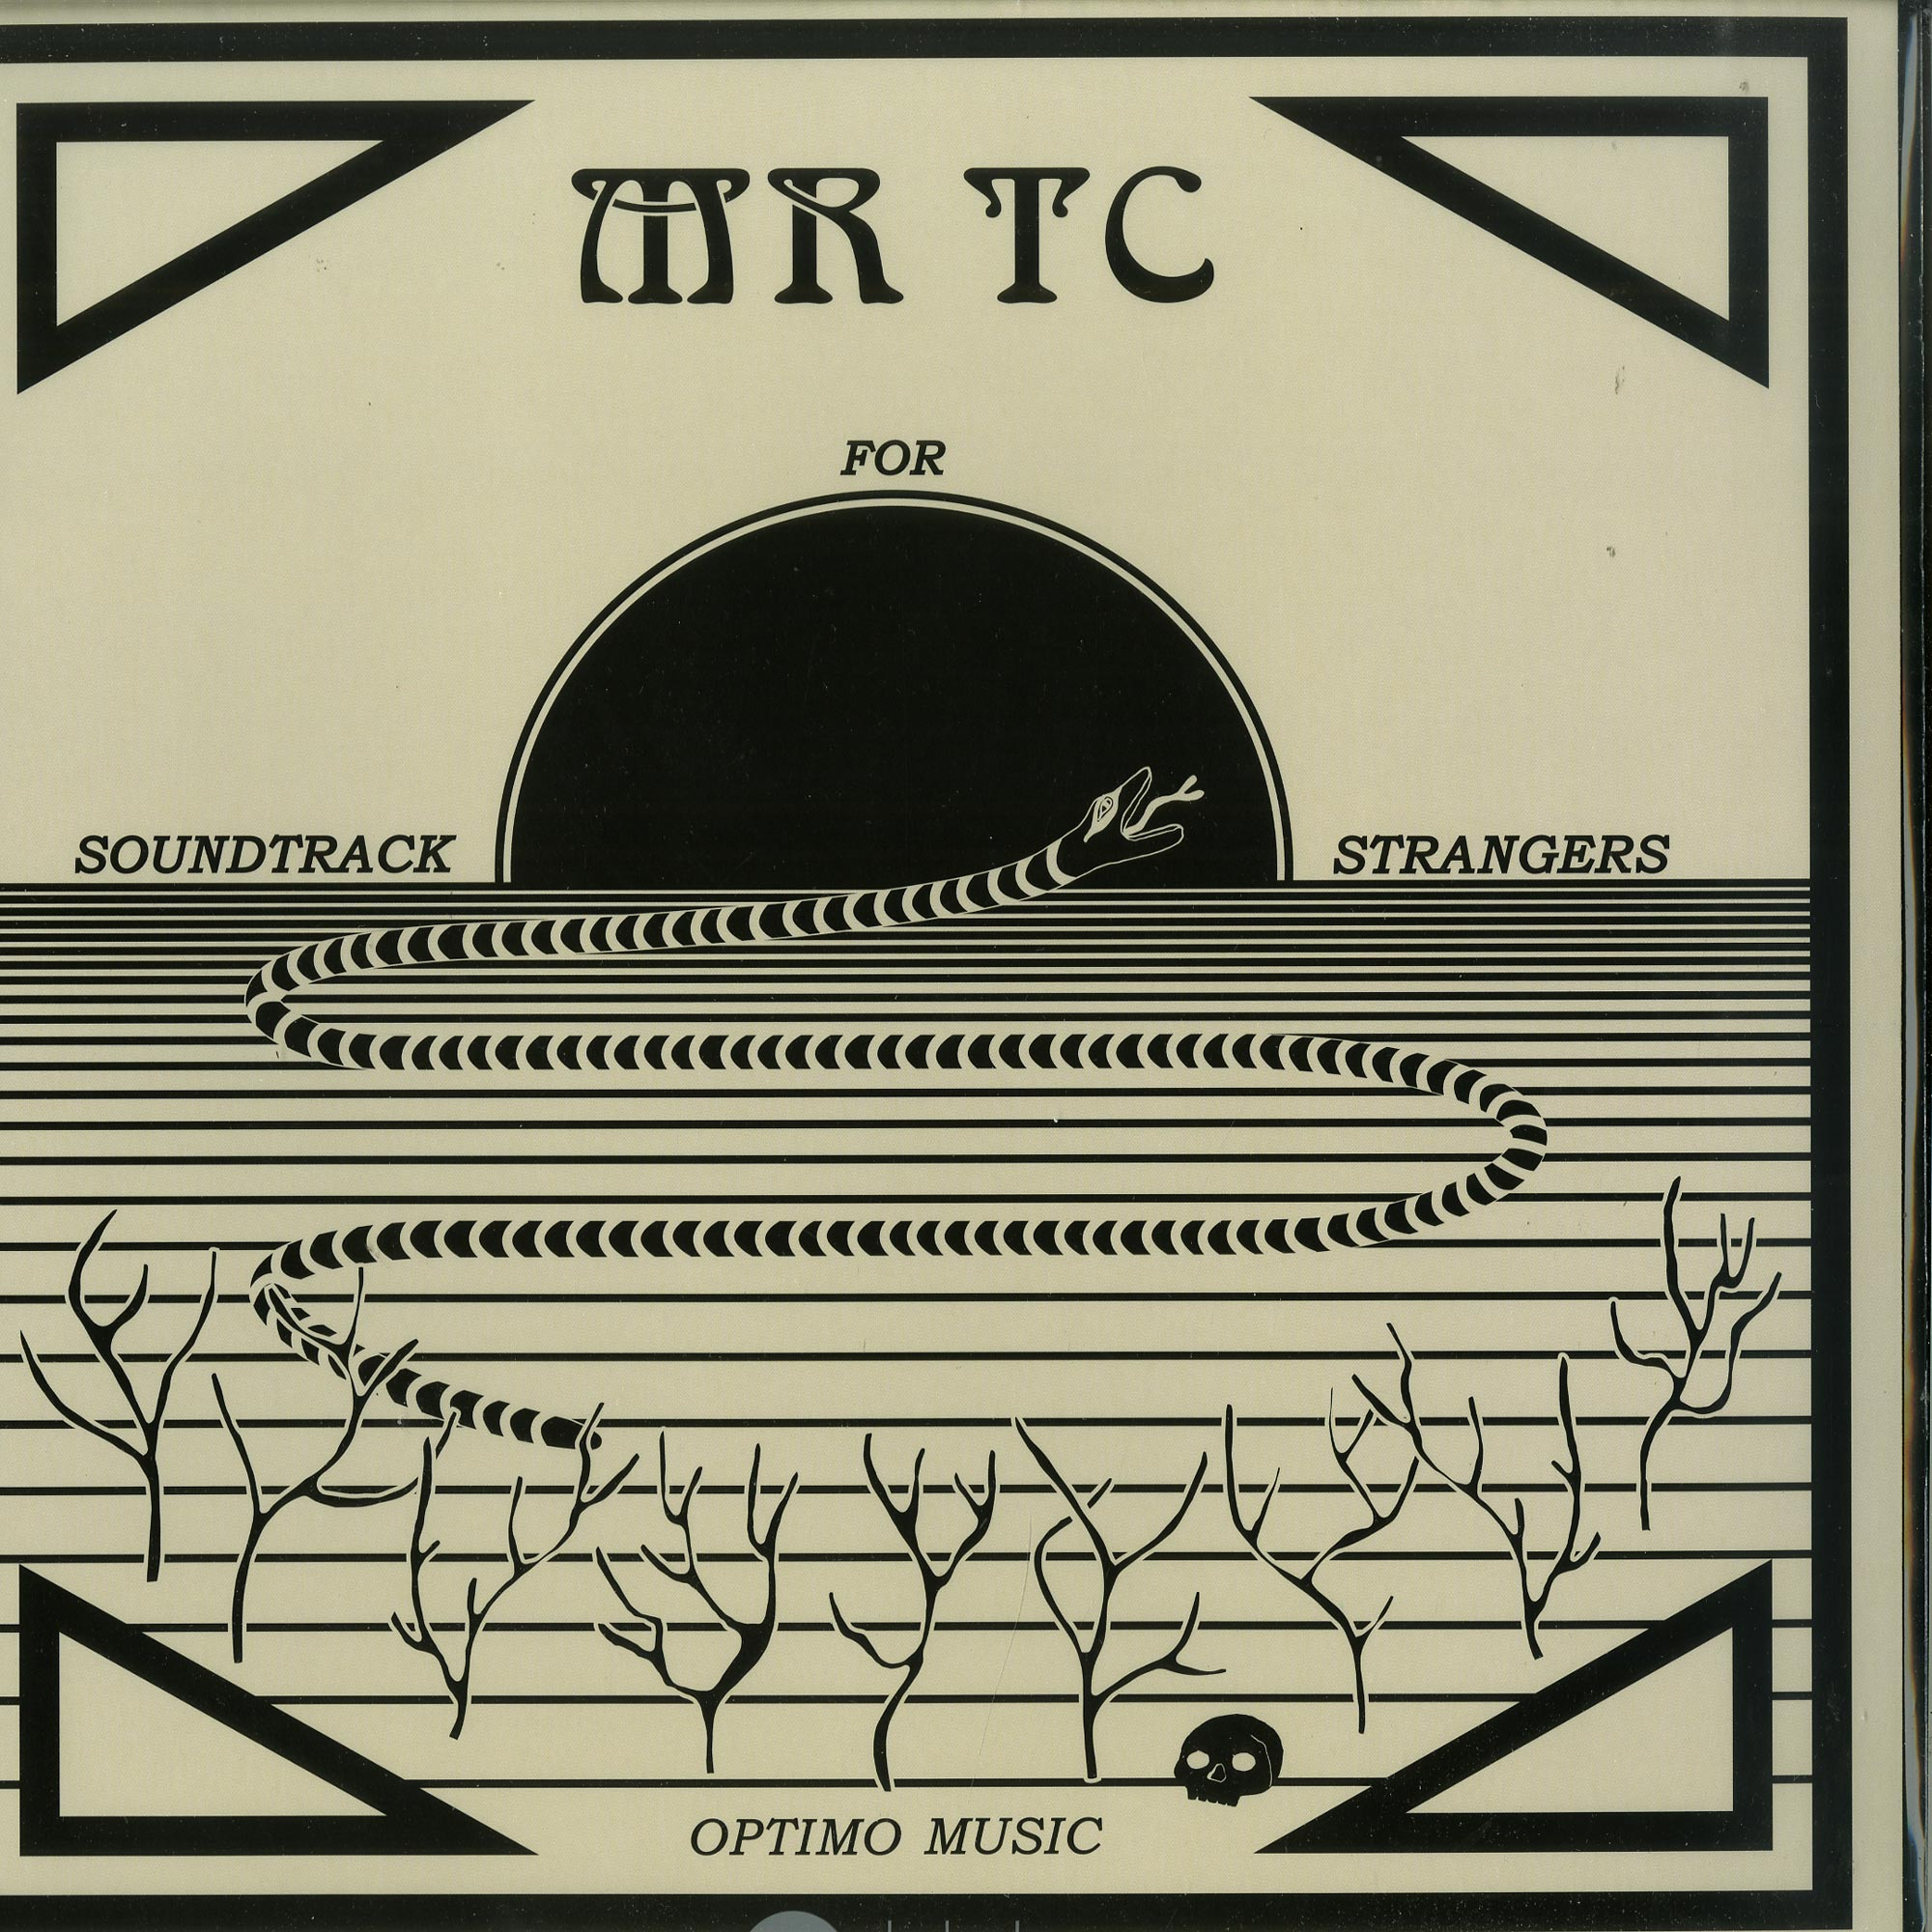 Mr TC - SOUNDTRACK FOR STRANGERS EP